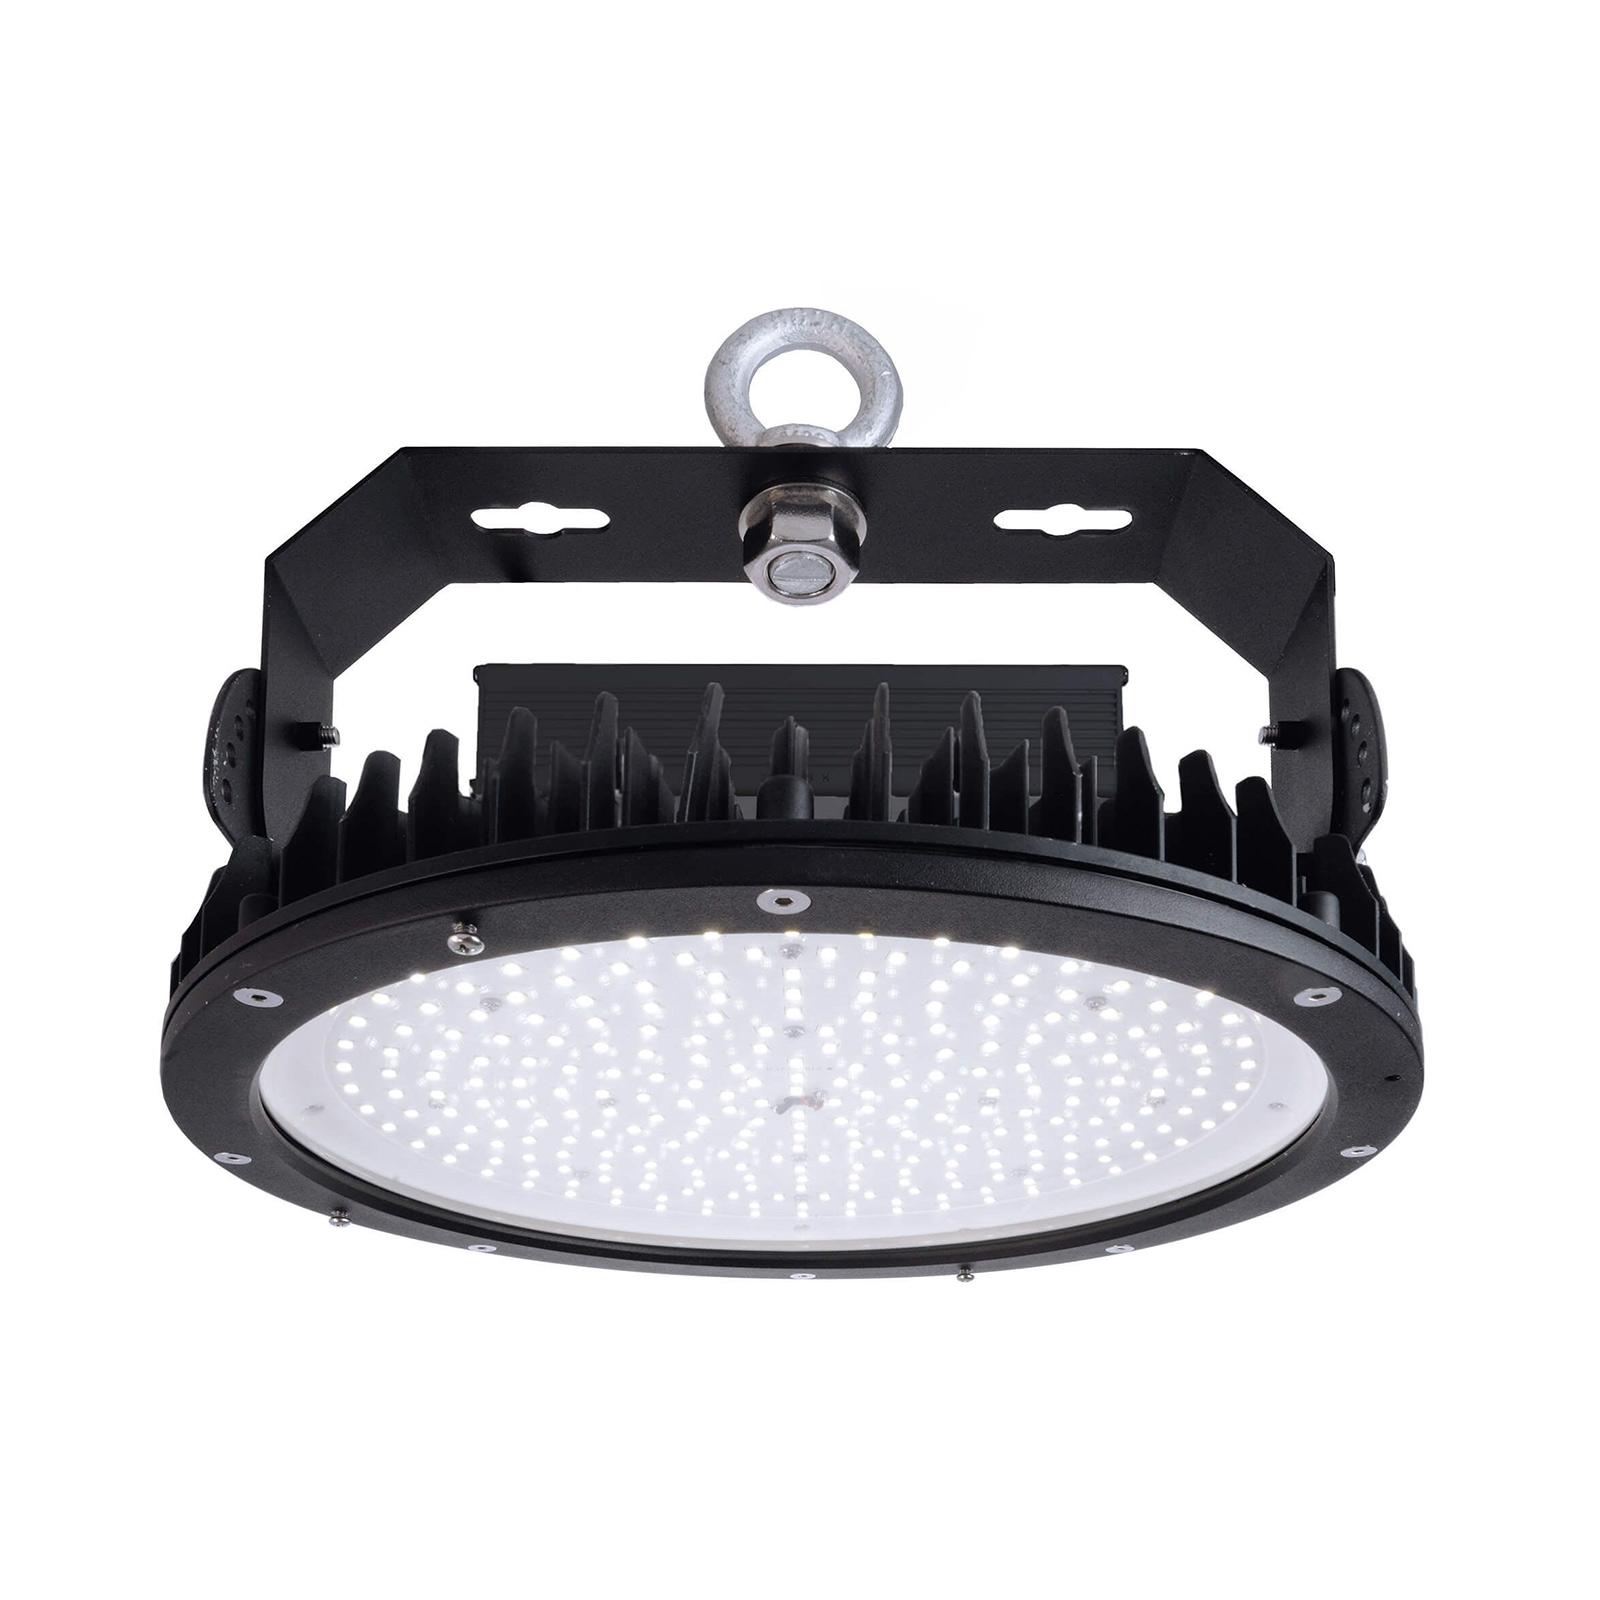 LED-Hallenstrahler Ainara 90, 5.000 K, 11.800 lm